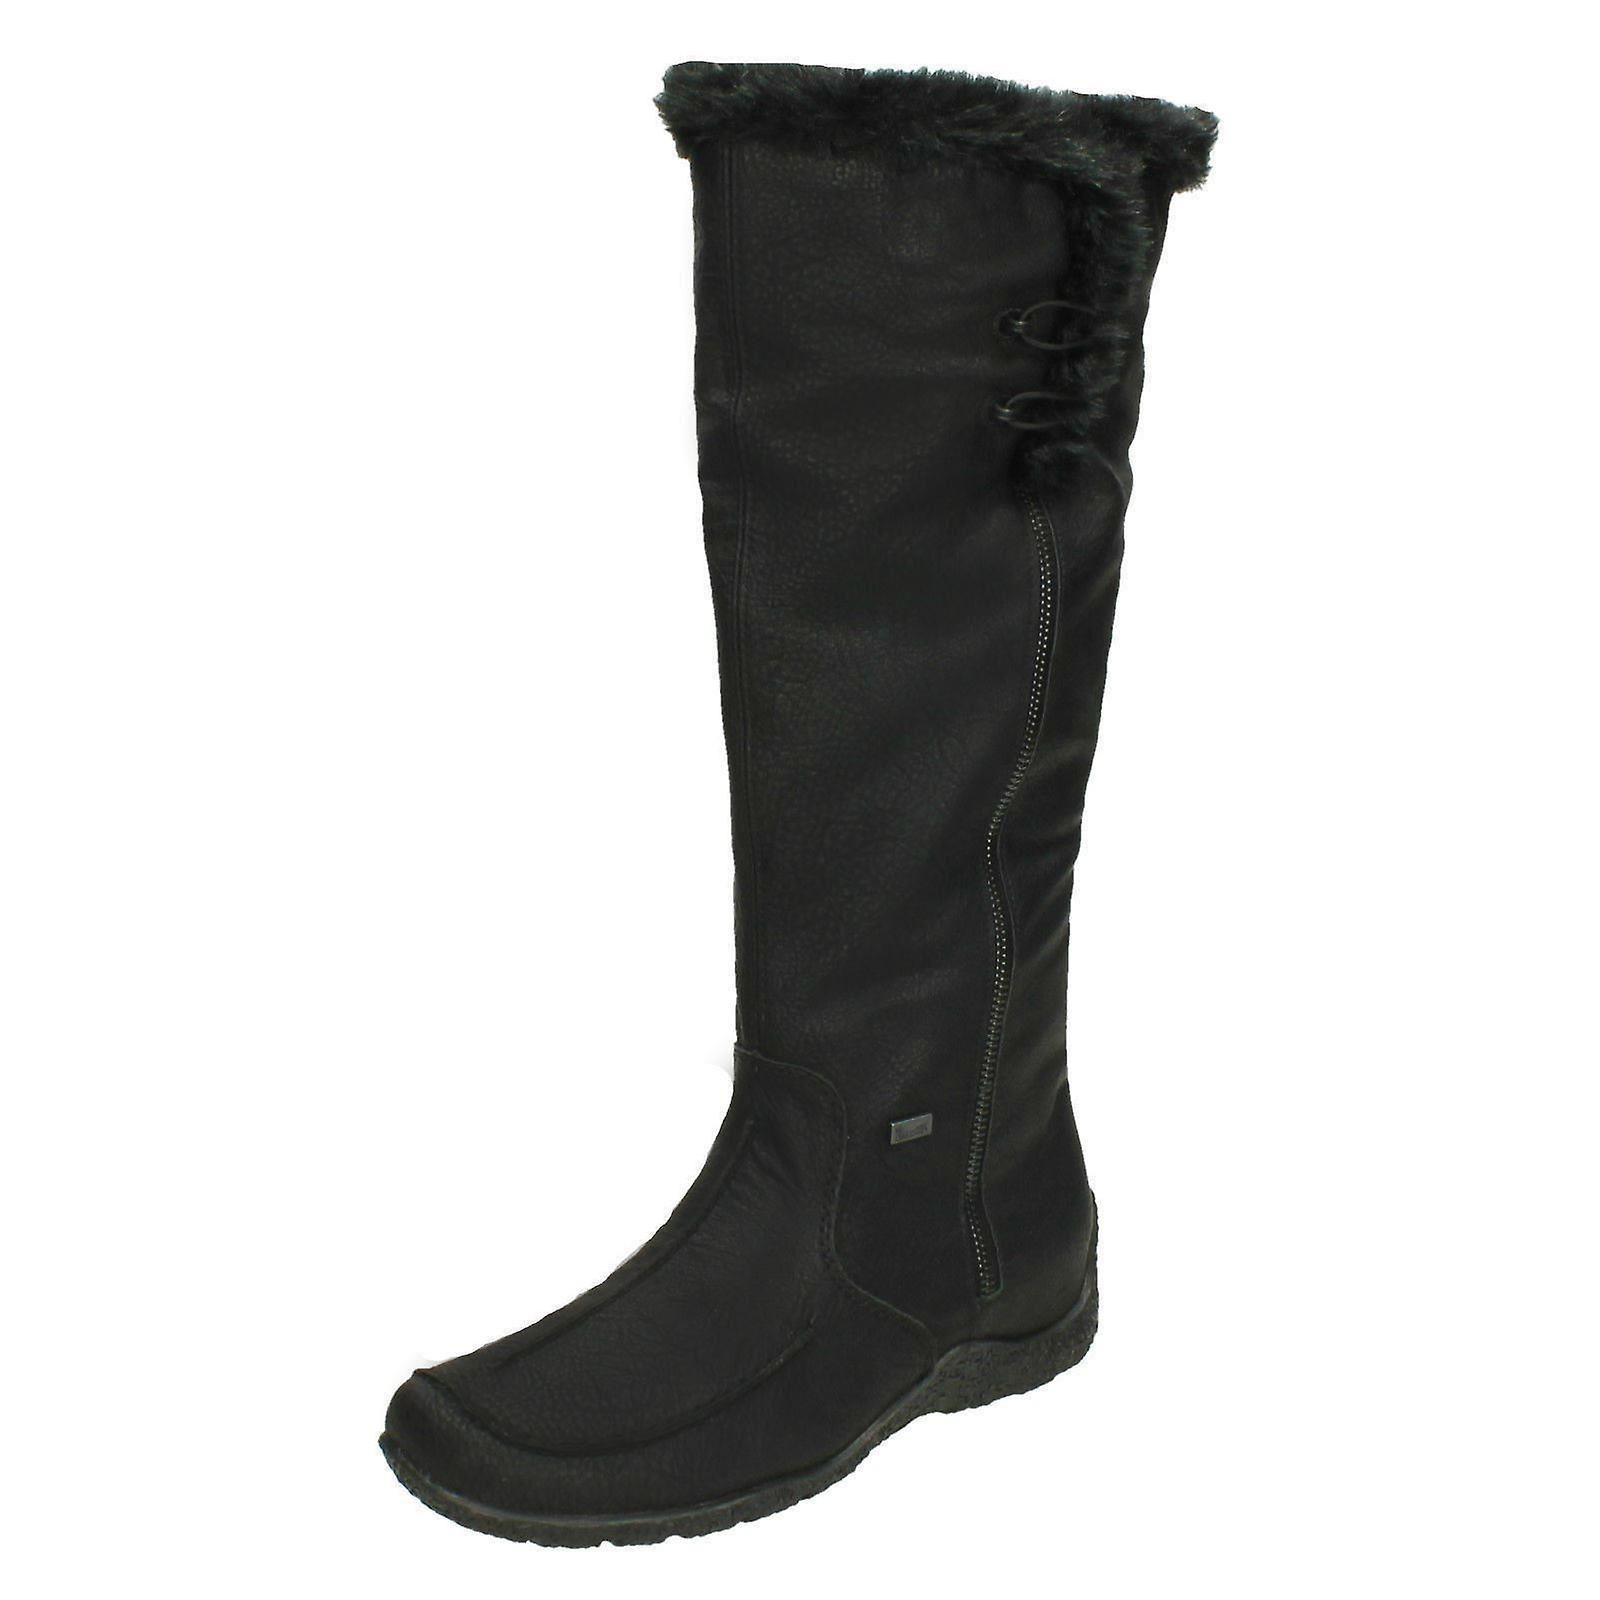 Rieker Damen kniehohe Stiefel 79954 Zip